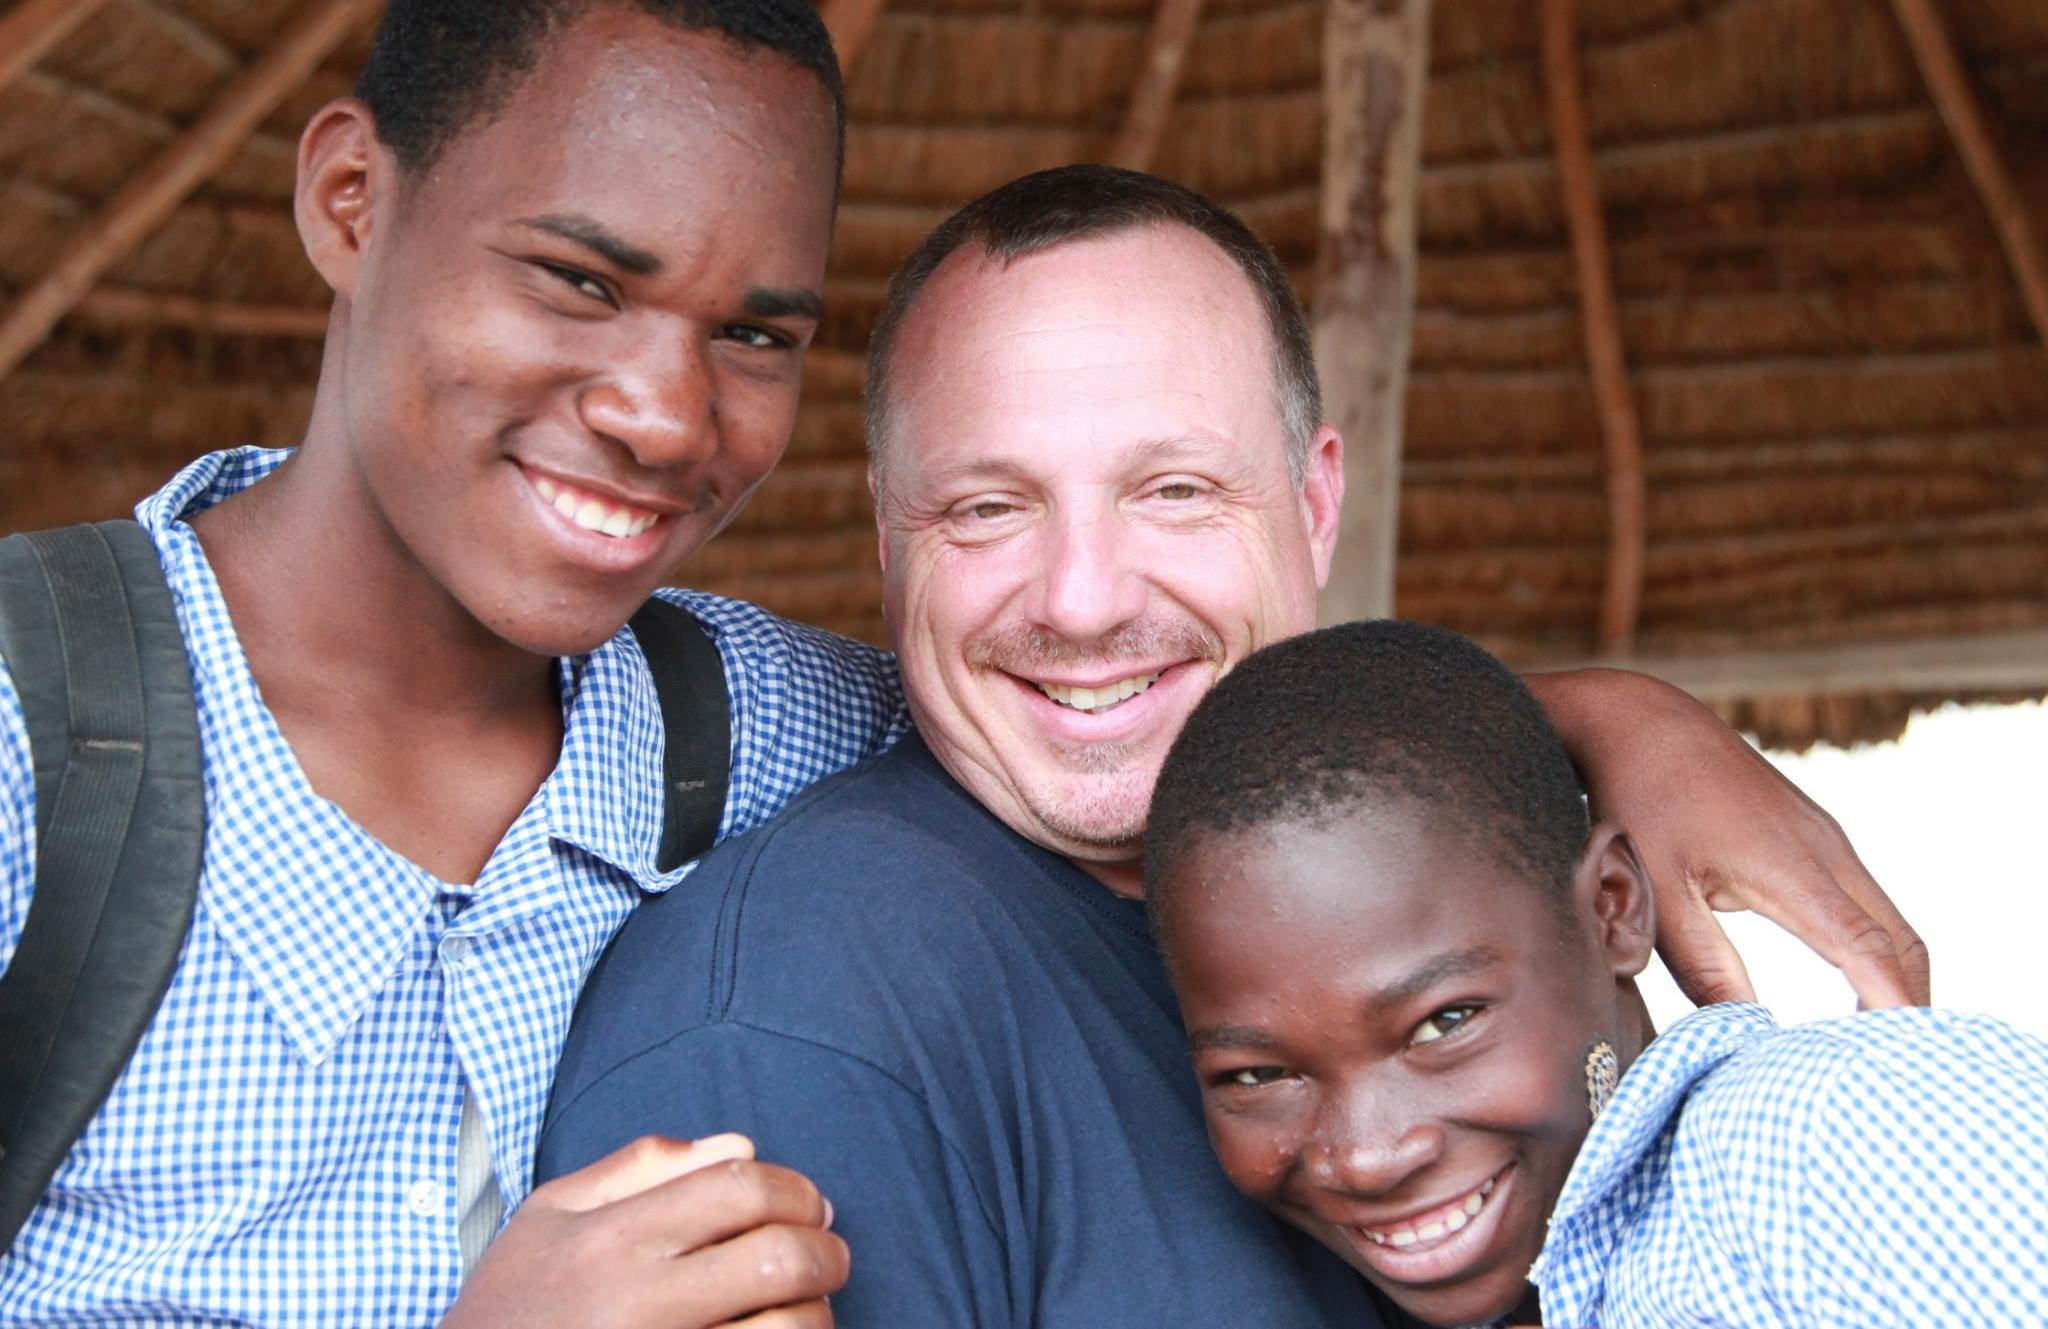 Peter Stratton Haiti pics 011.JPG